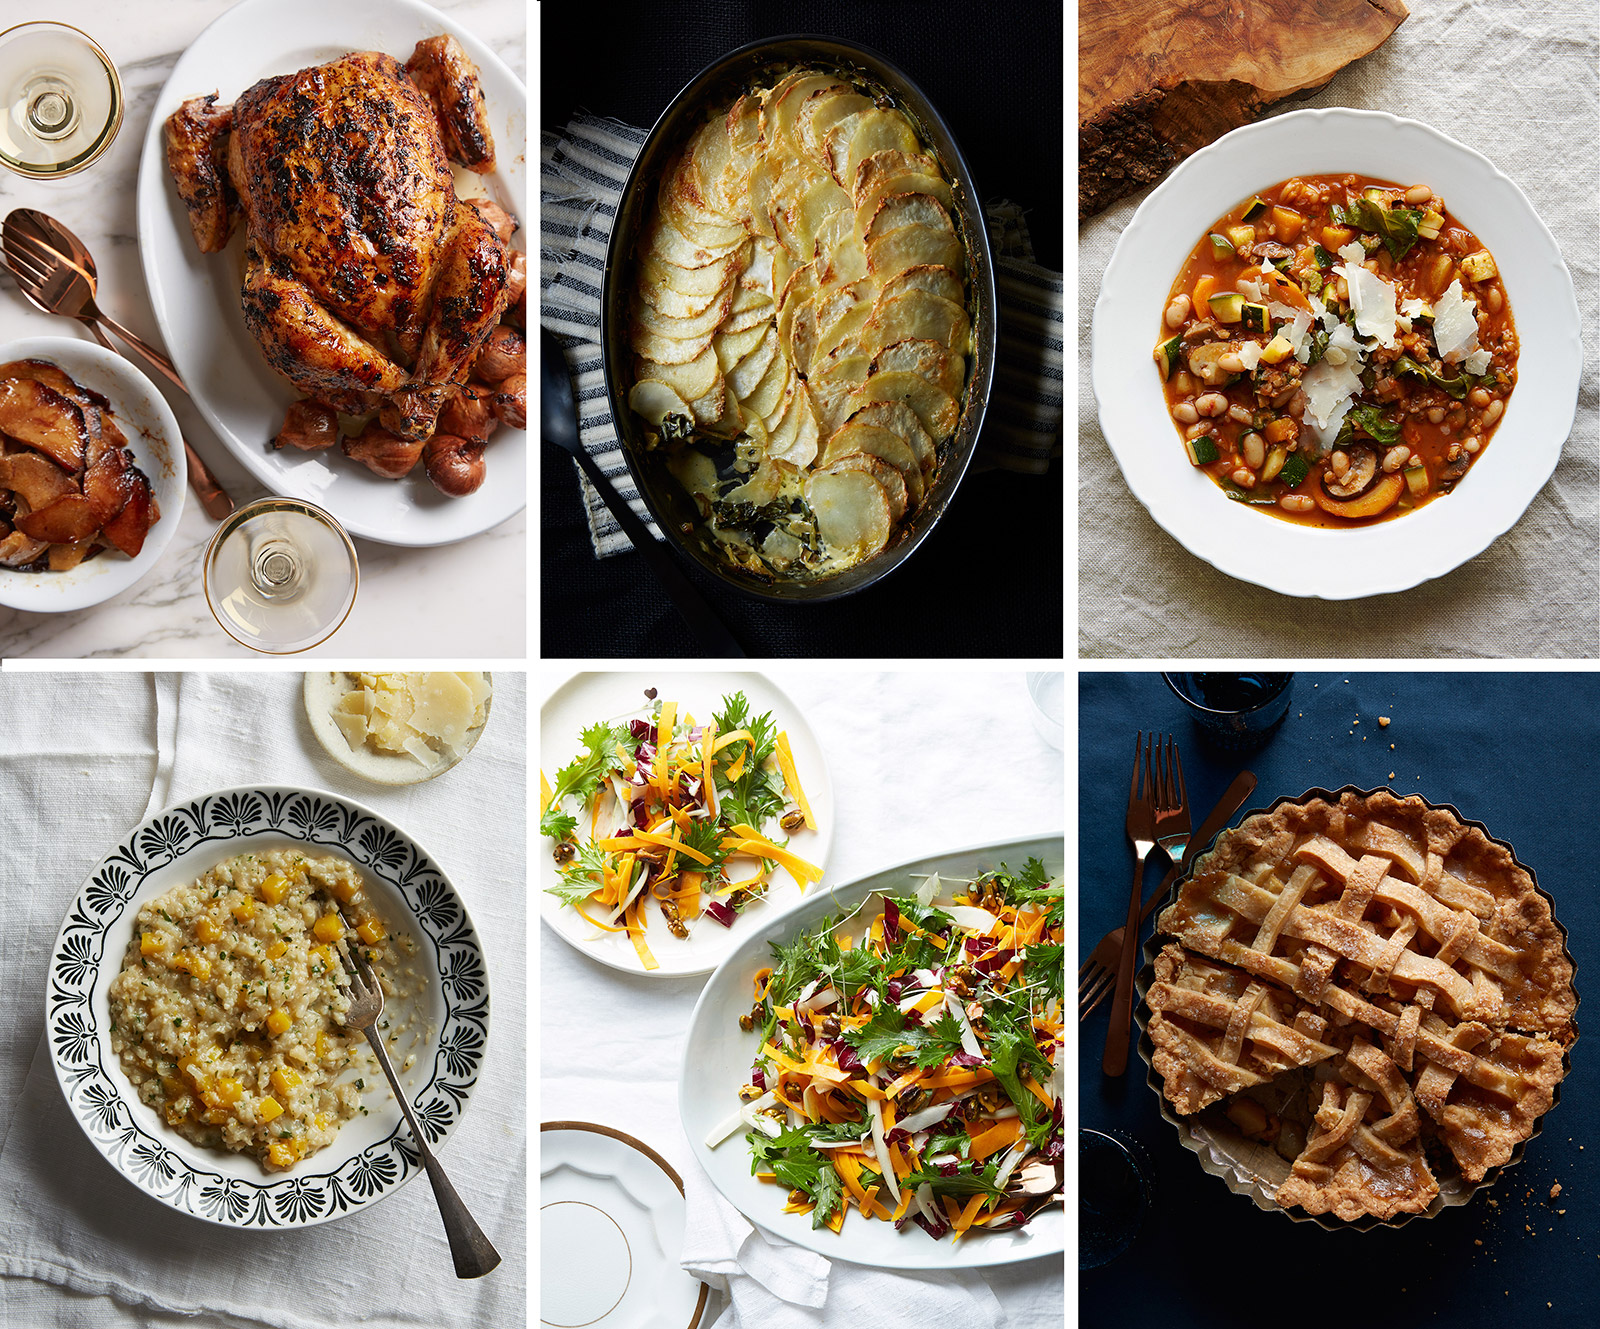 From left to right: Caraway Quince Chicken  ;  Celeriac Potato Gratin;  Fall Minestrone with Buckwheat;  Pumpkin Cauliflower Risotto;  Butternut, Chicory & Mizuna Salad  ;  Pear, Vanilla, Black Pepper & Ginger Lattice Pie